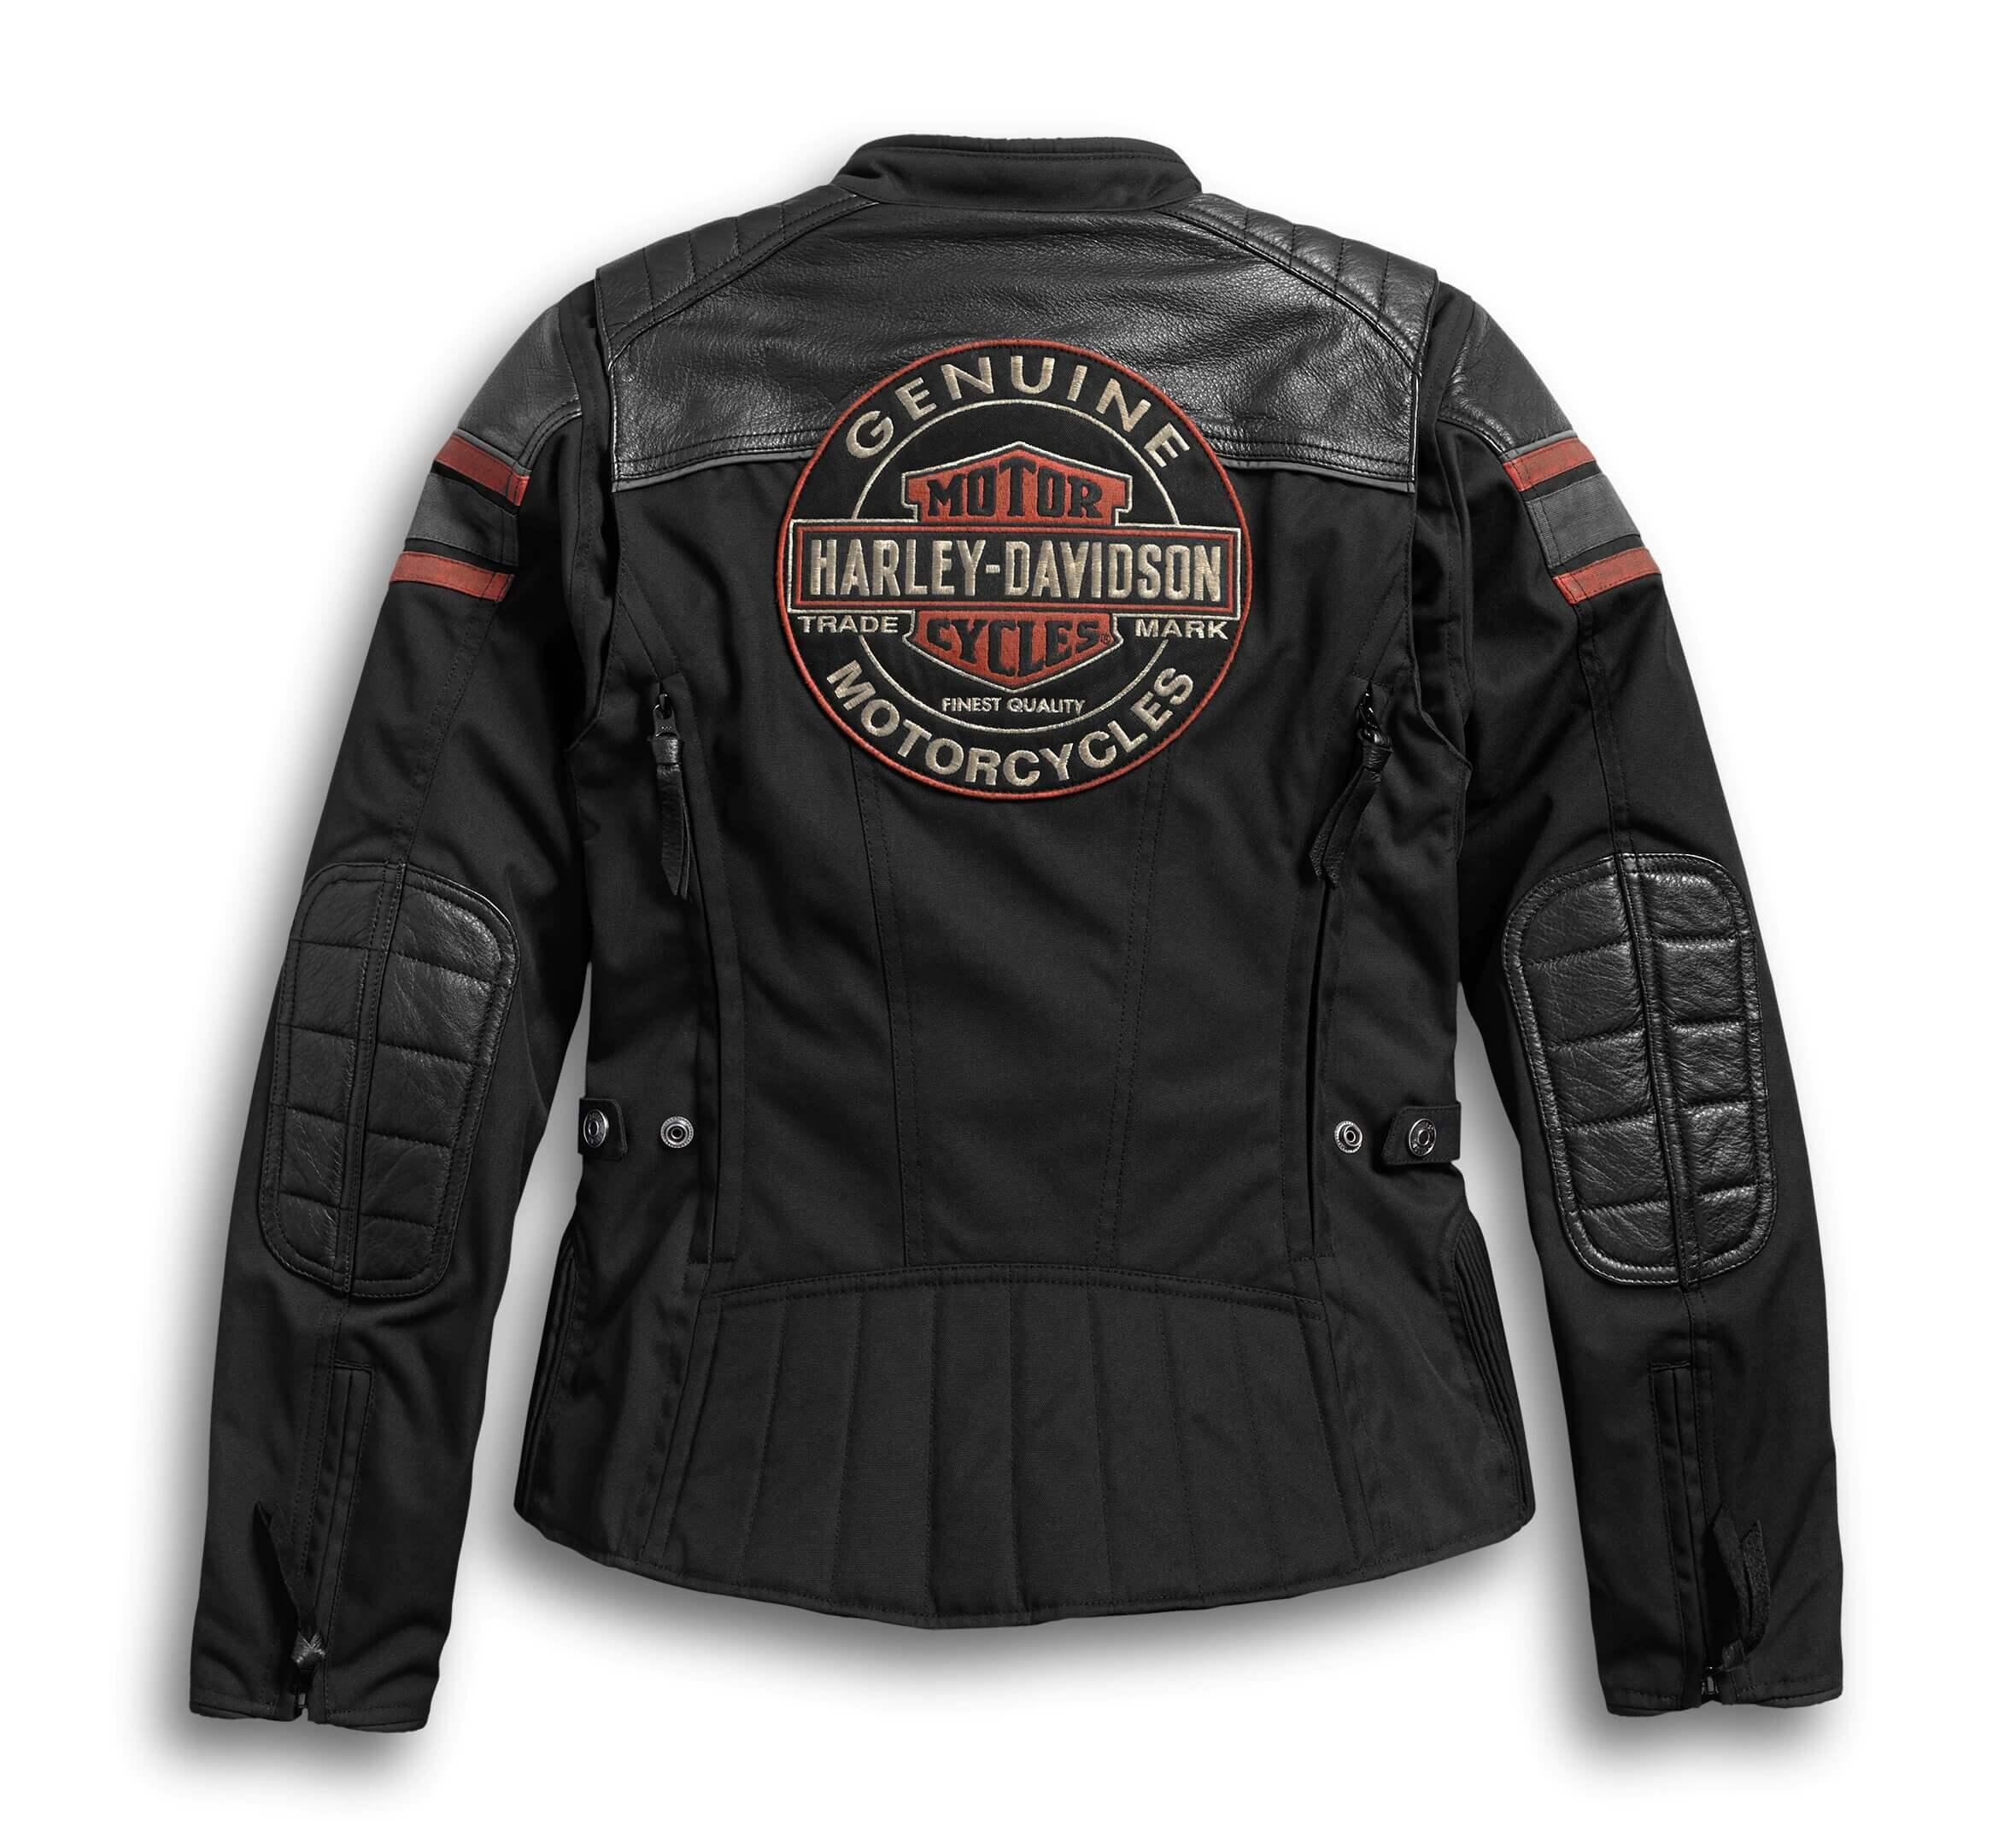 Black Harley Davidson Riding Leather Jacket